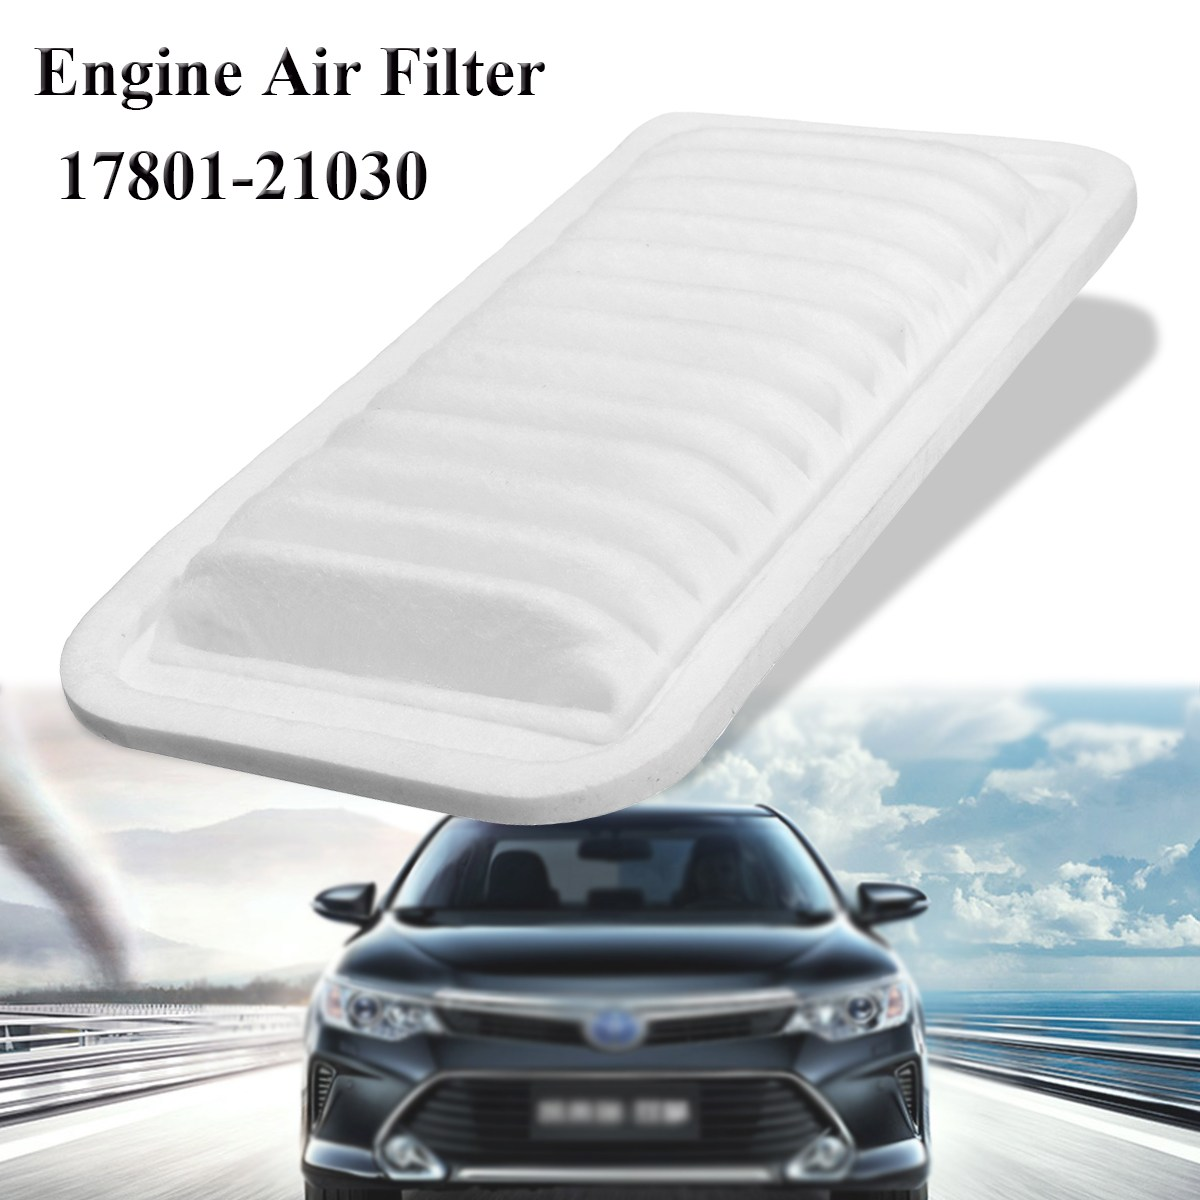 Engine air filter for toyota yaris echo scion xa xb 2000 2005 17801